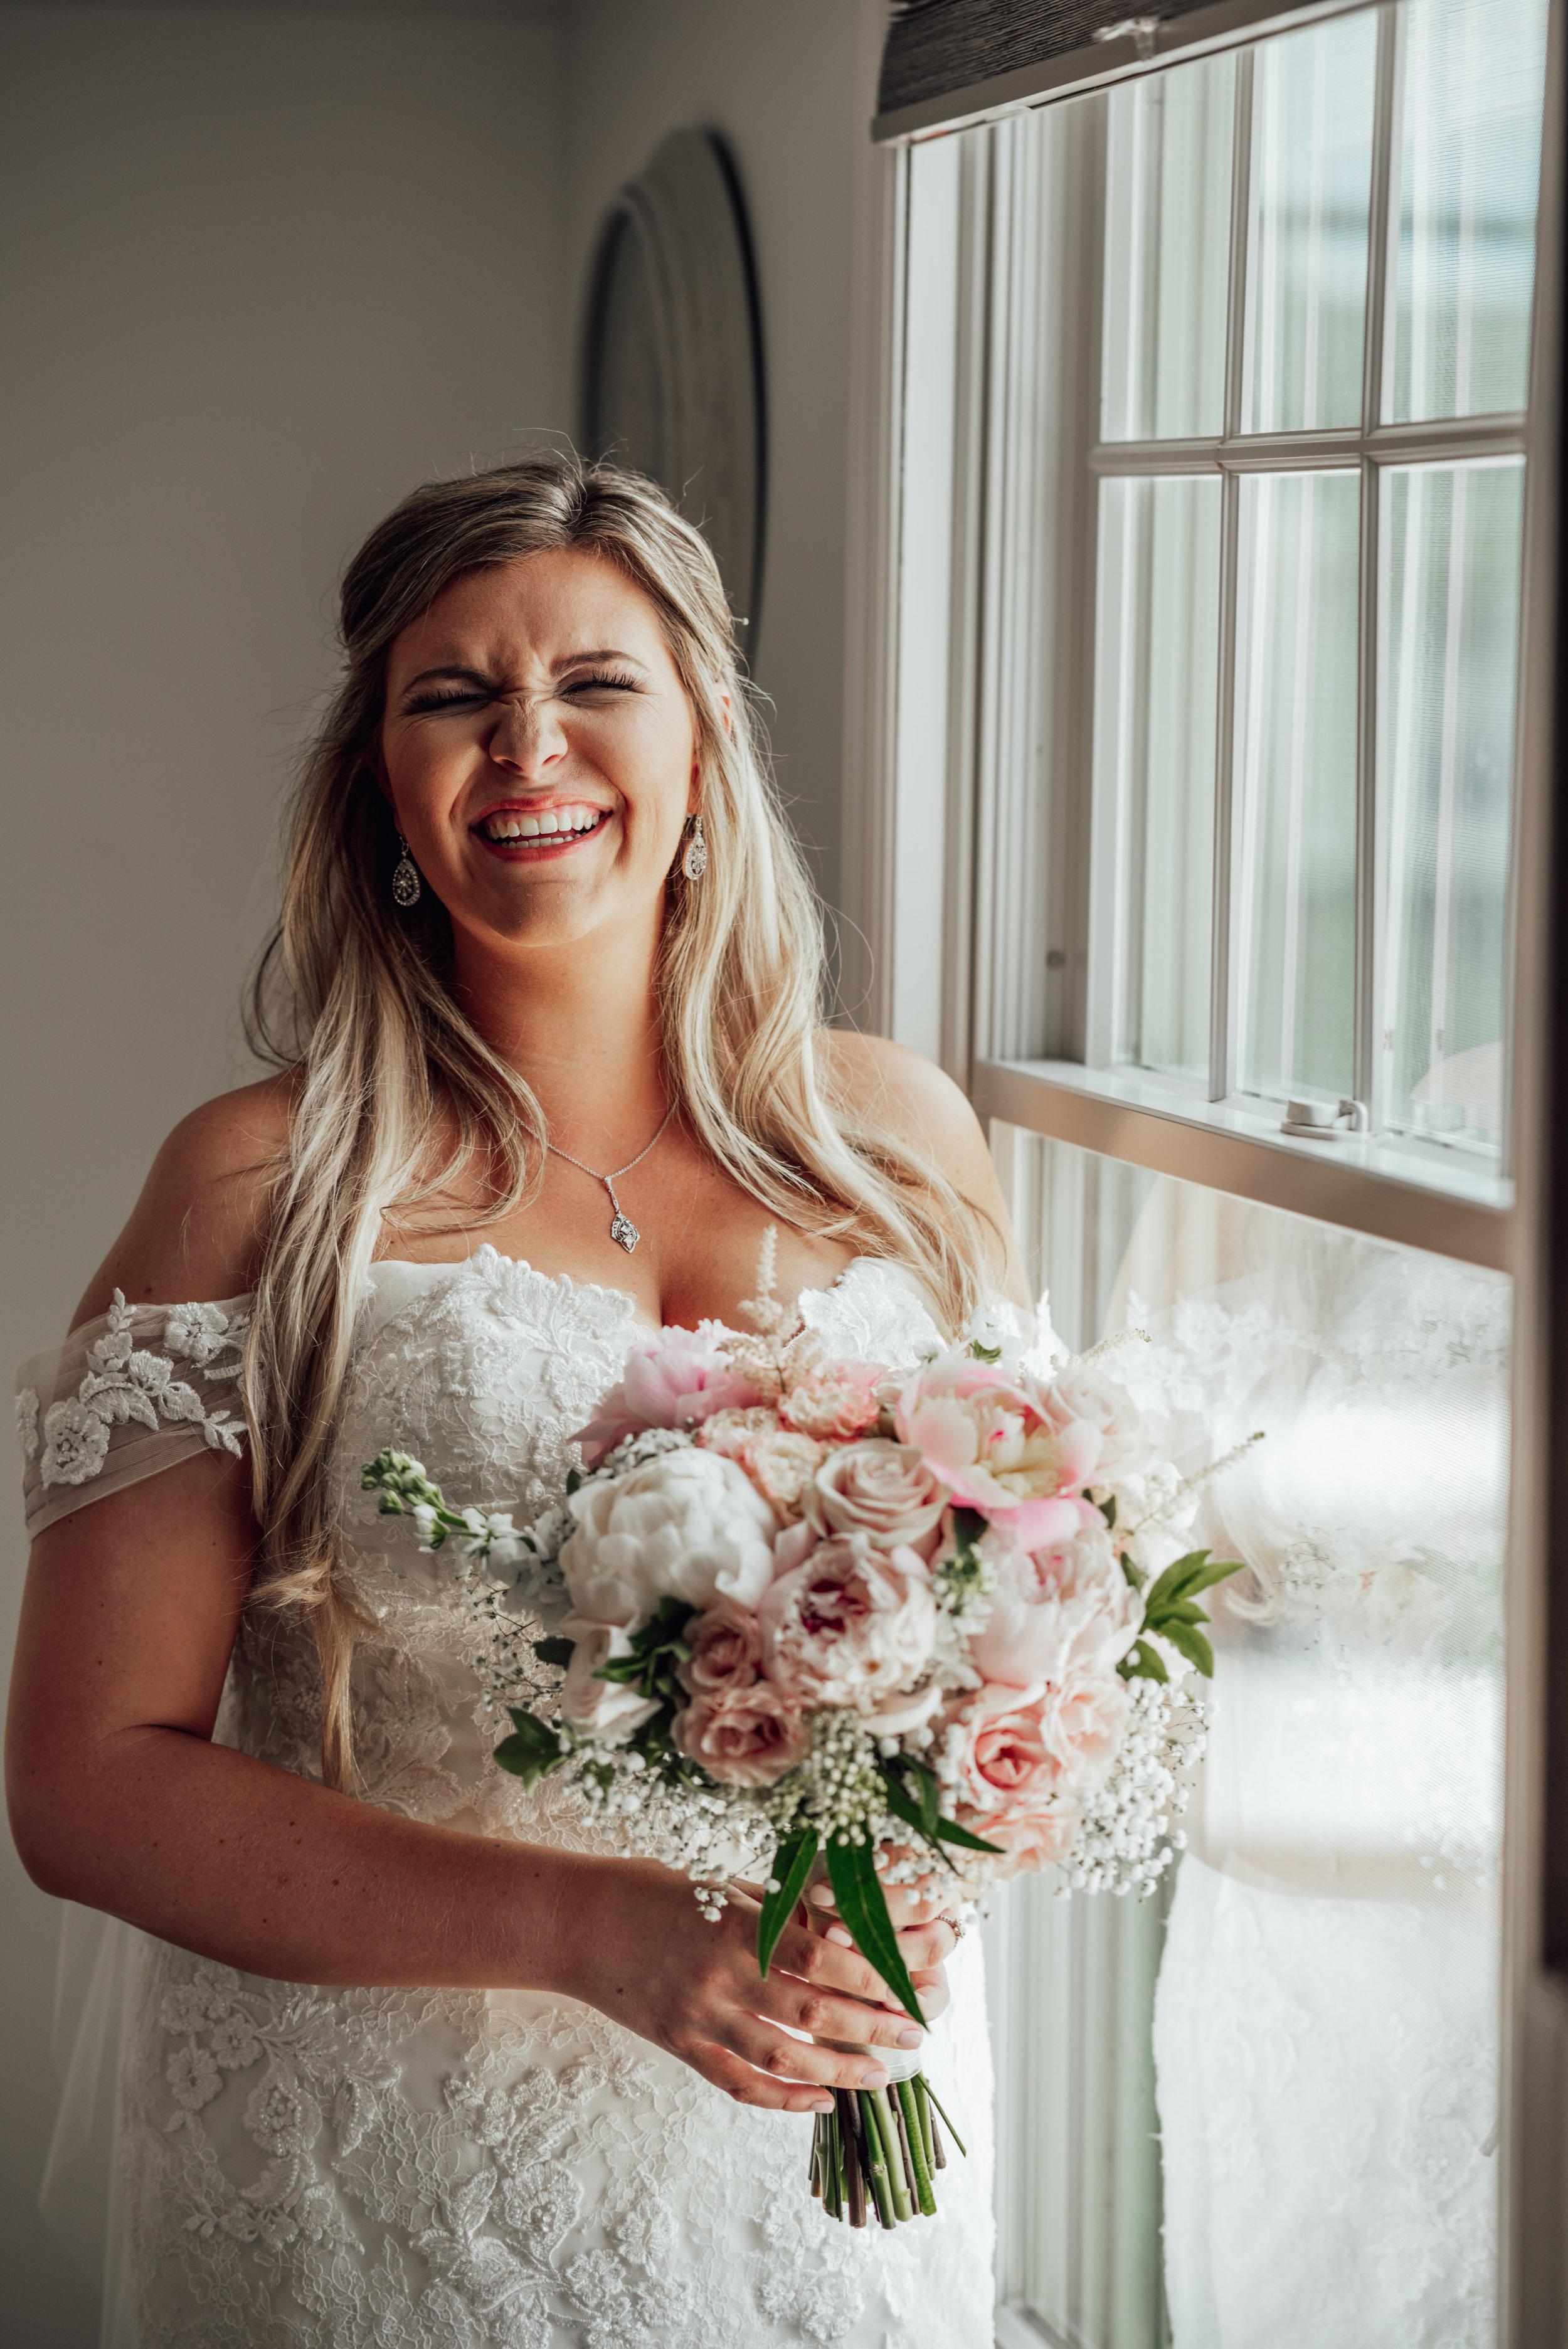 New Jersey Wedding Photographer, Felsberg Photography LBI wedding photography 38.jpg